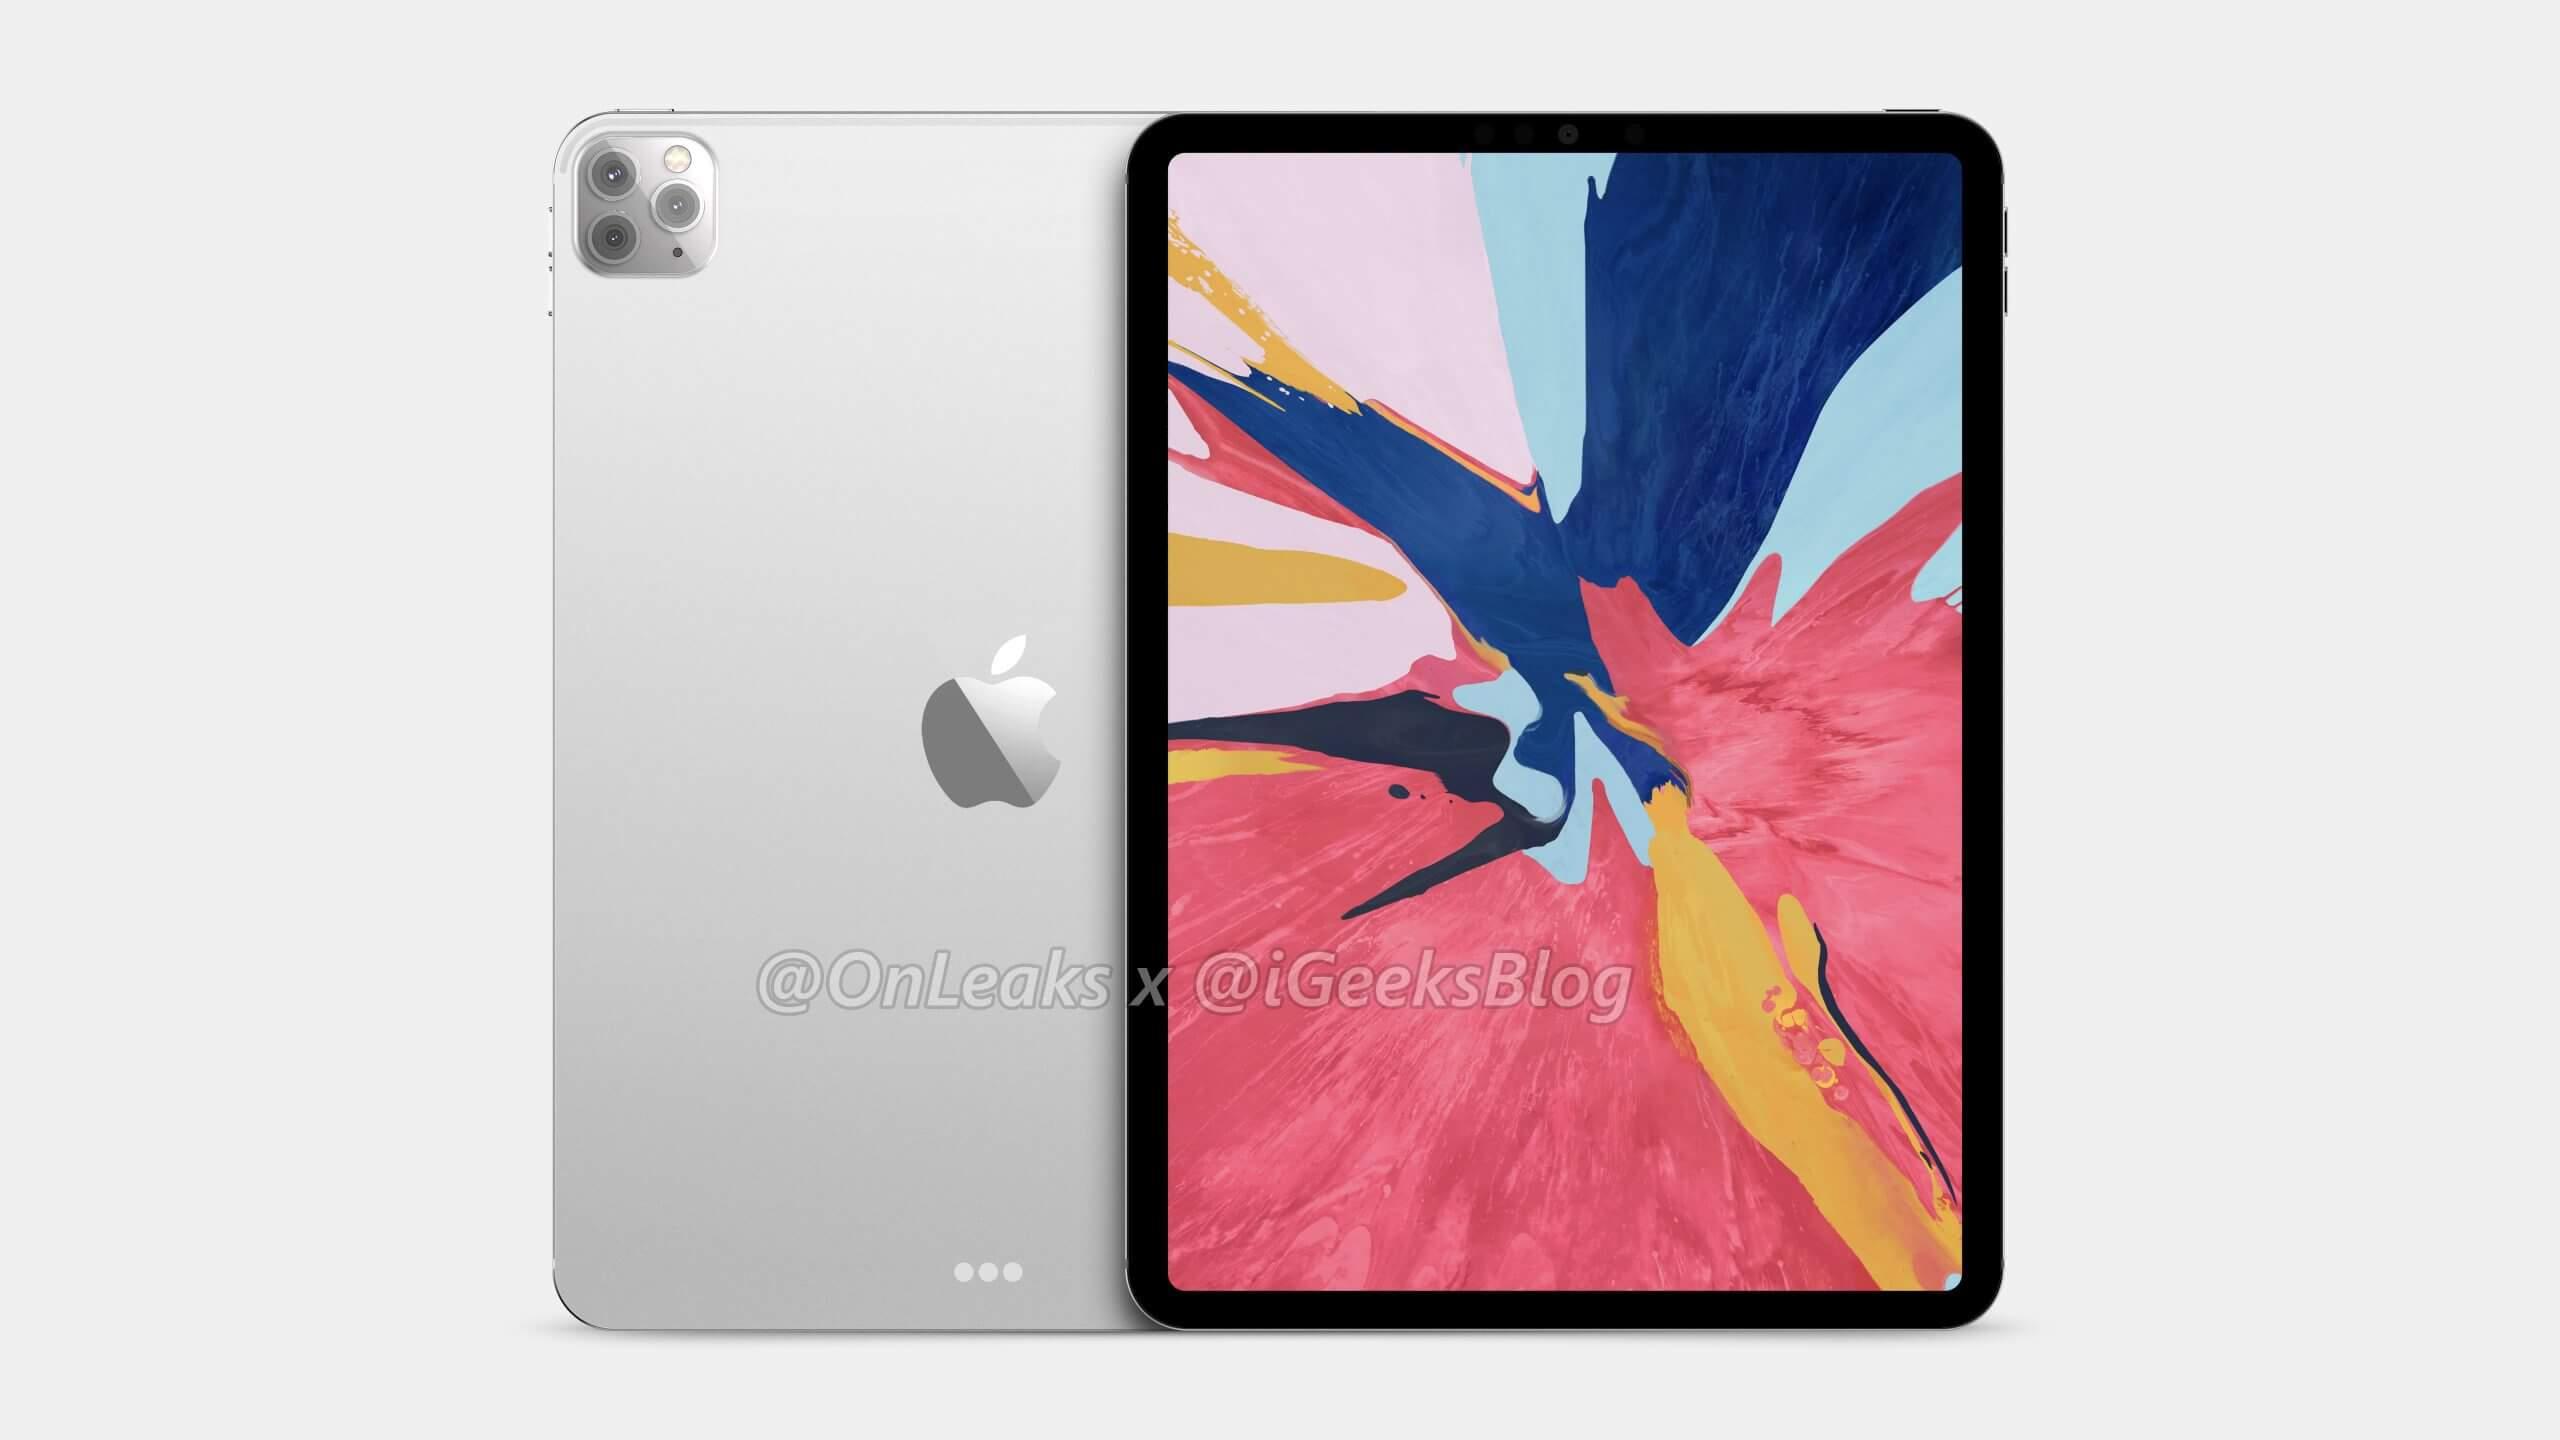 2020 11-inch iPad Pro with Triple Camera